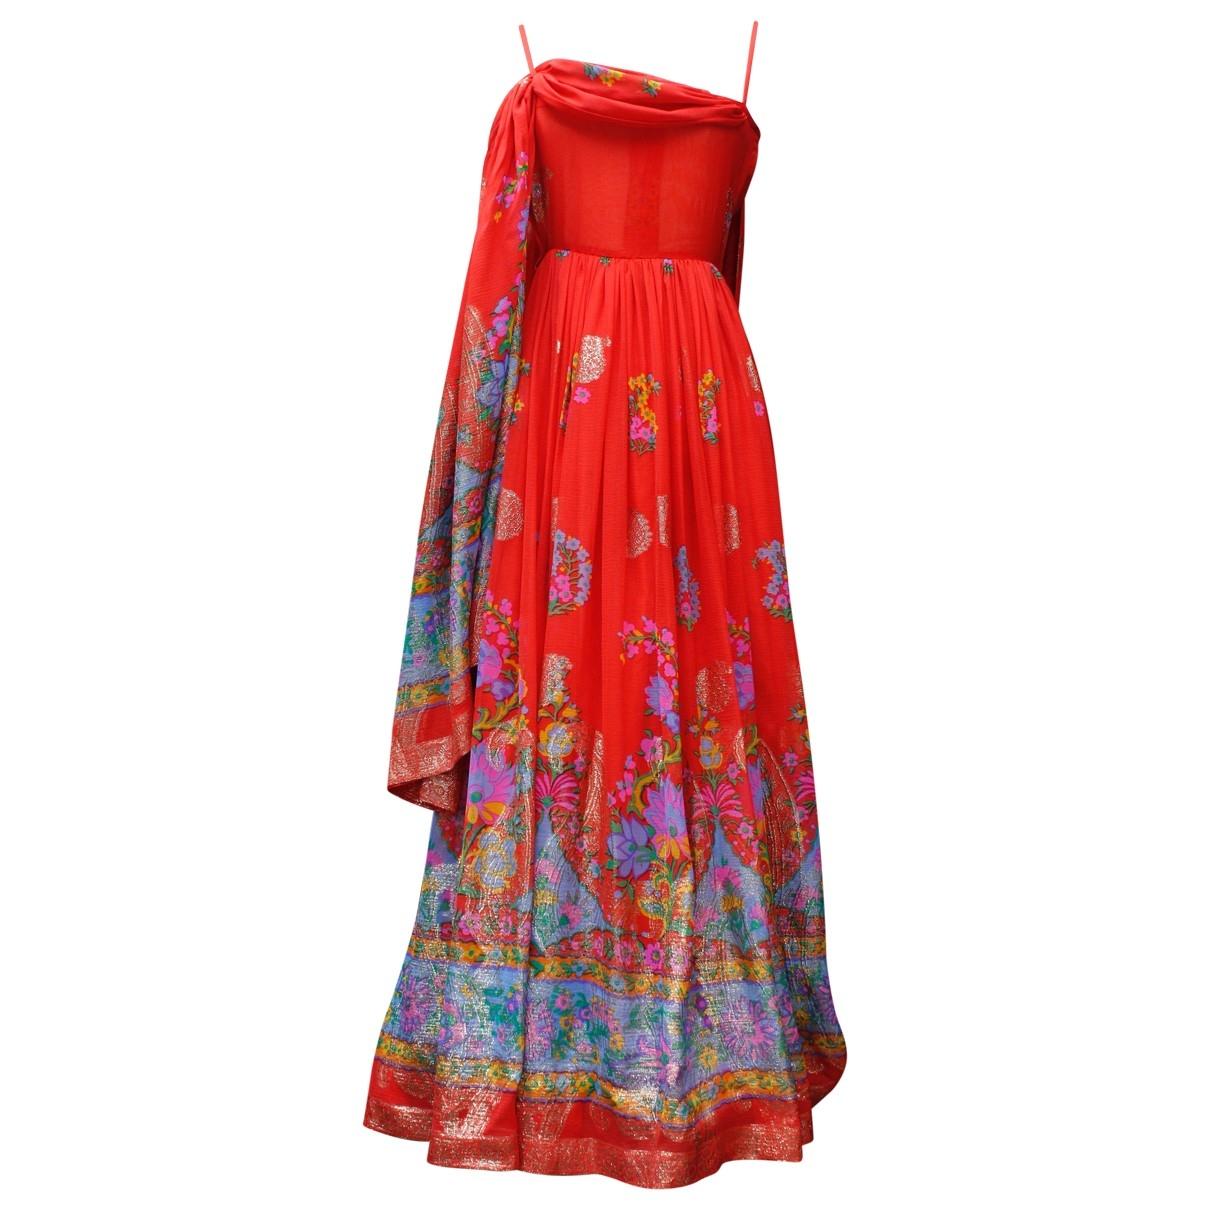 Lanvin \N Red Silk dress for Women 36 FR